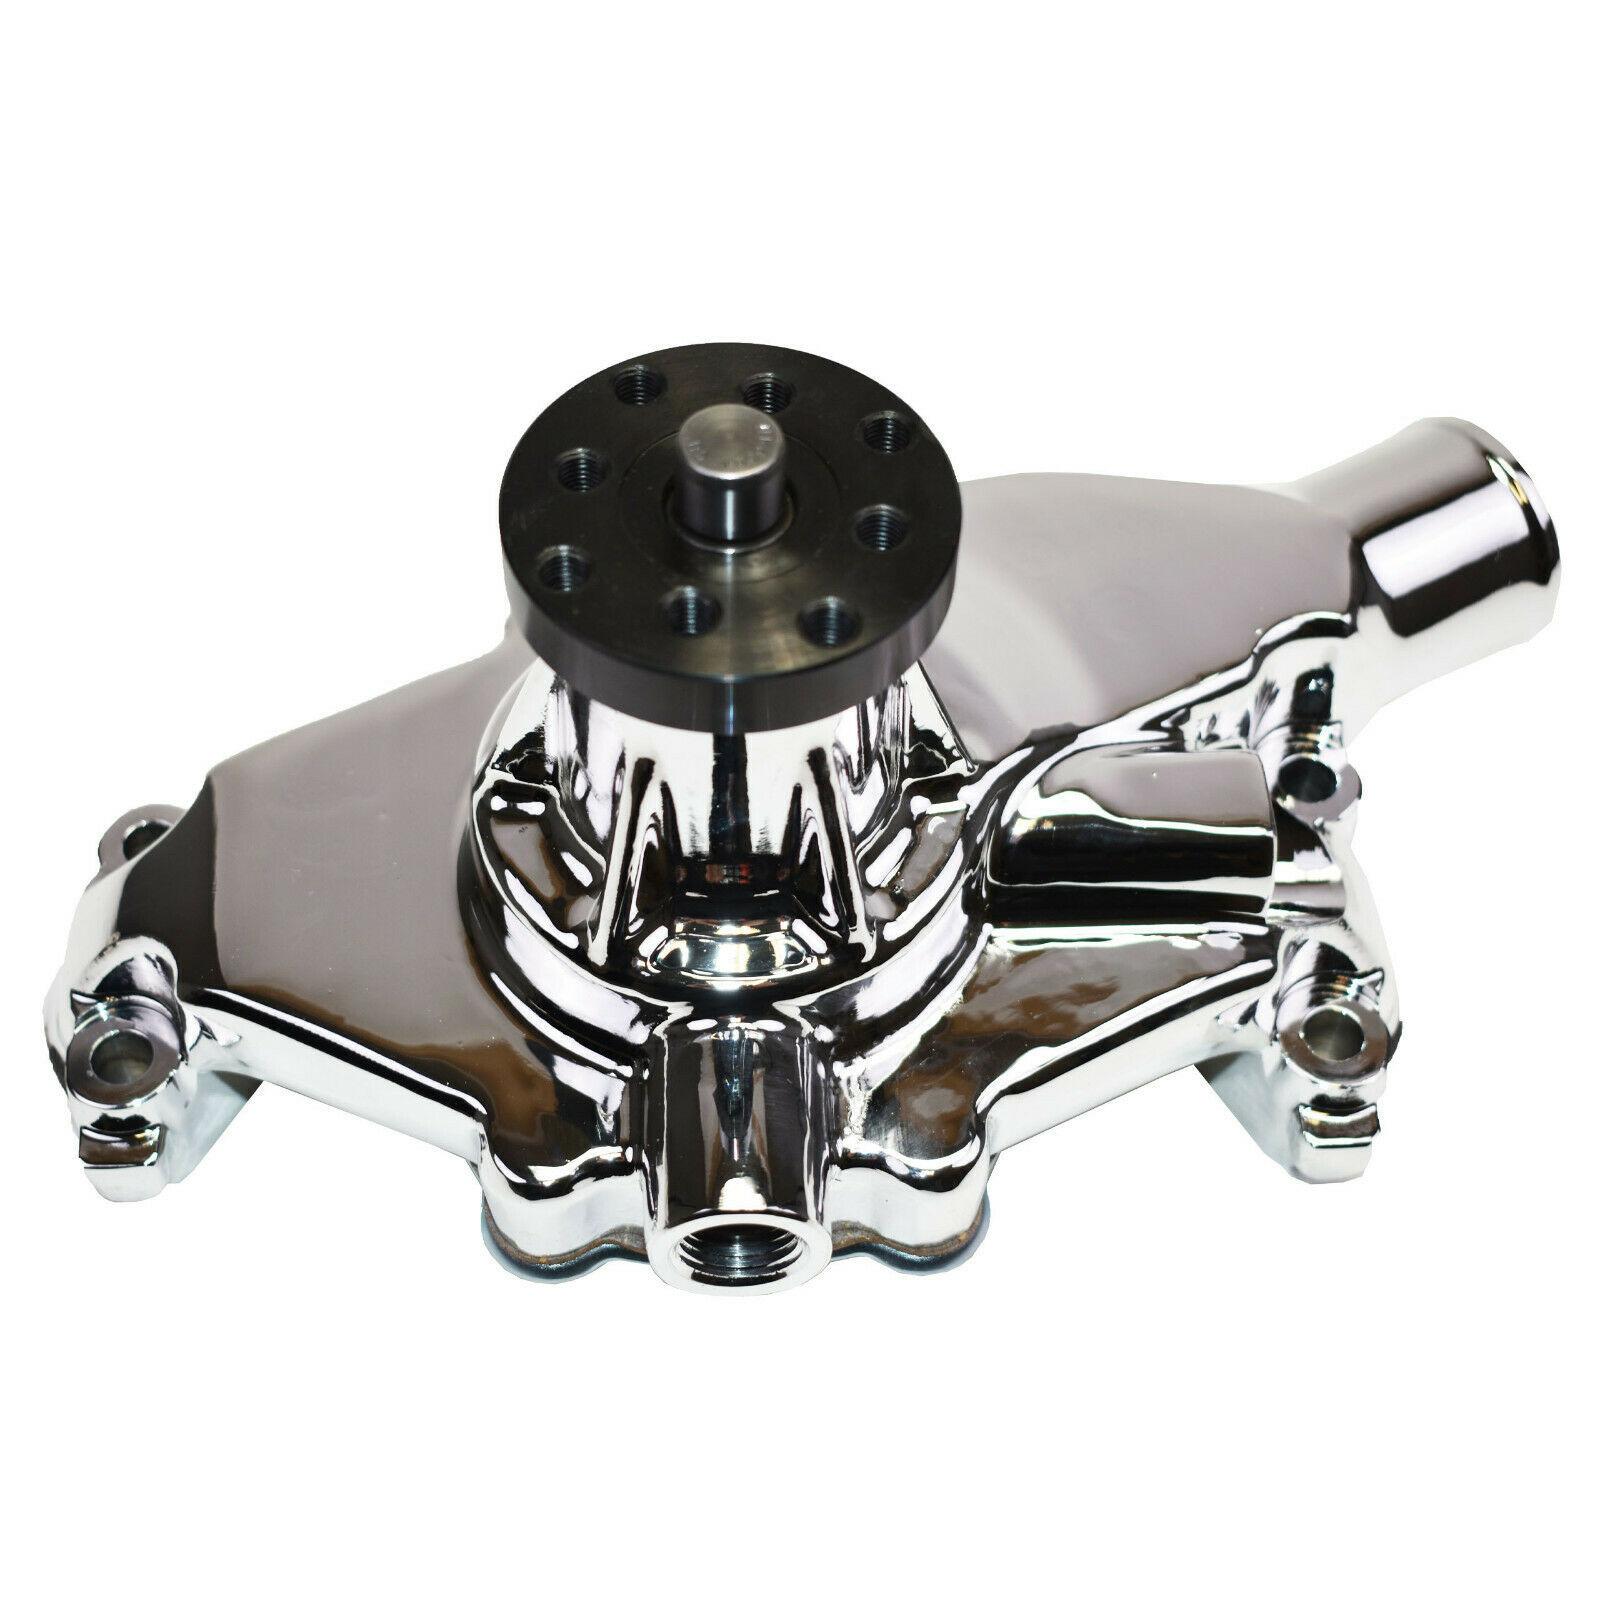 "GM SBC SWP 265 267 283 350 8-Blade Aluminum 5/8"" High Volume Chrome Water Pump"